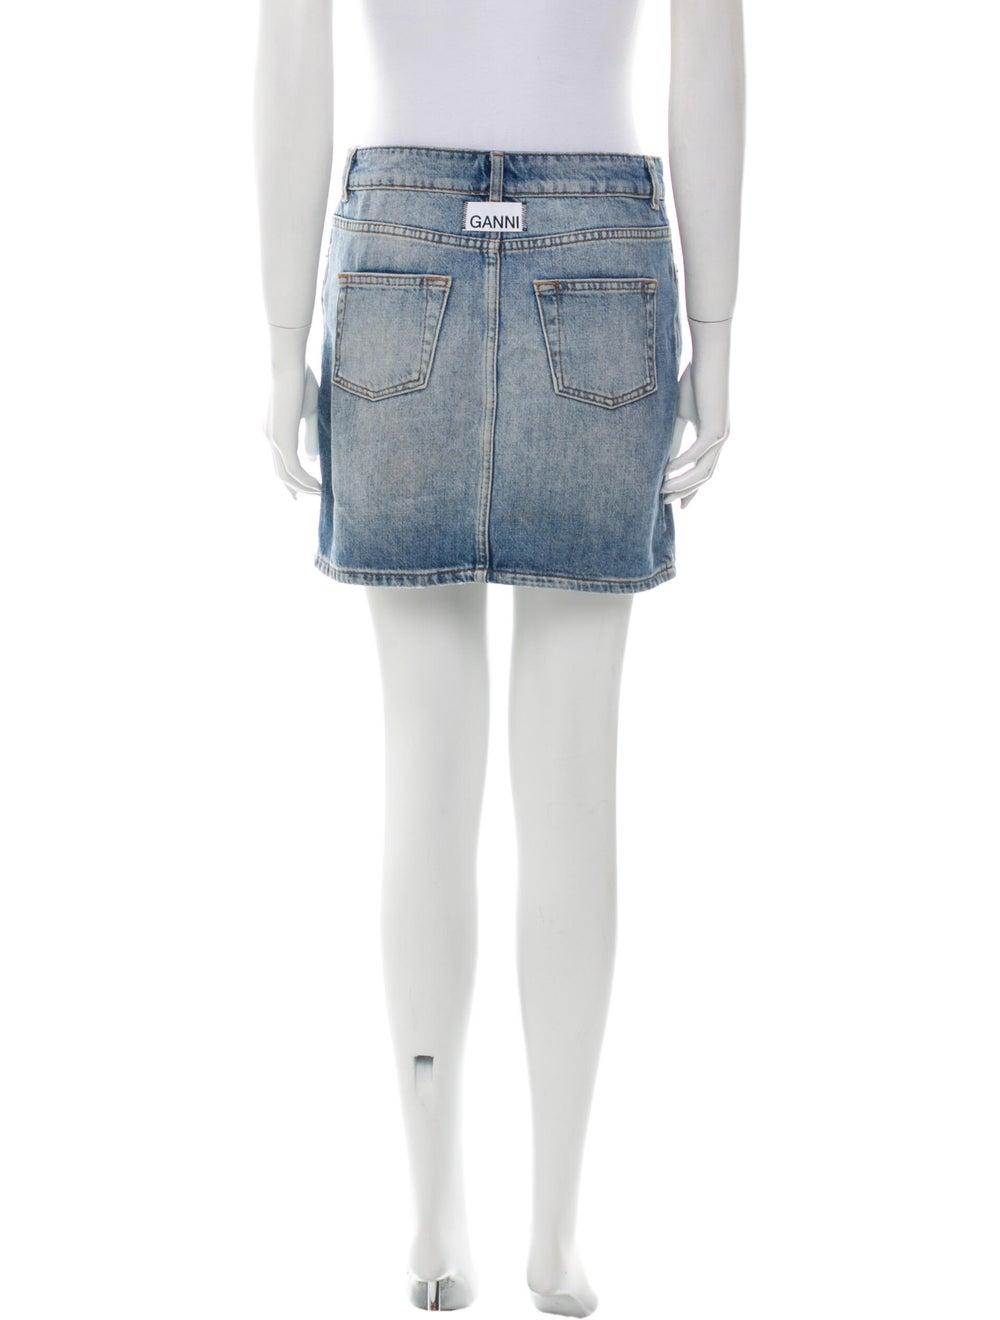 Ganni Mini Skirt Blue - image 3